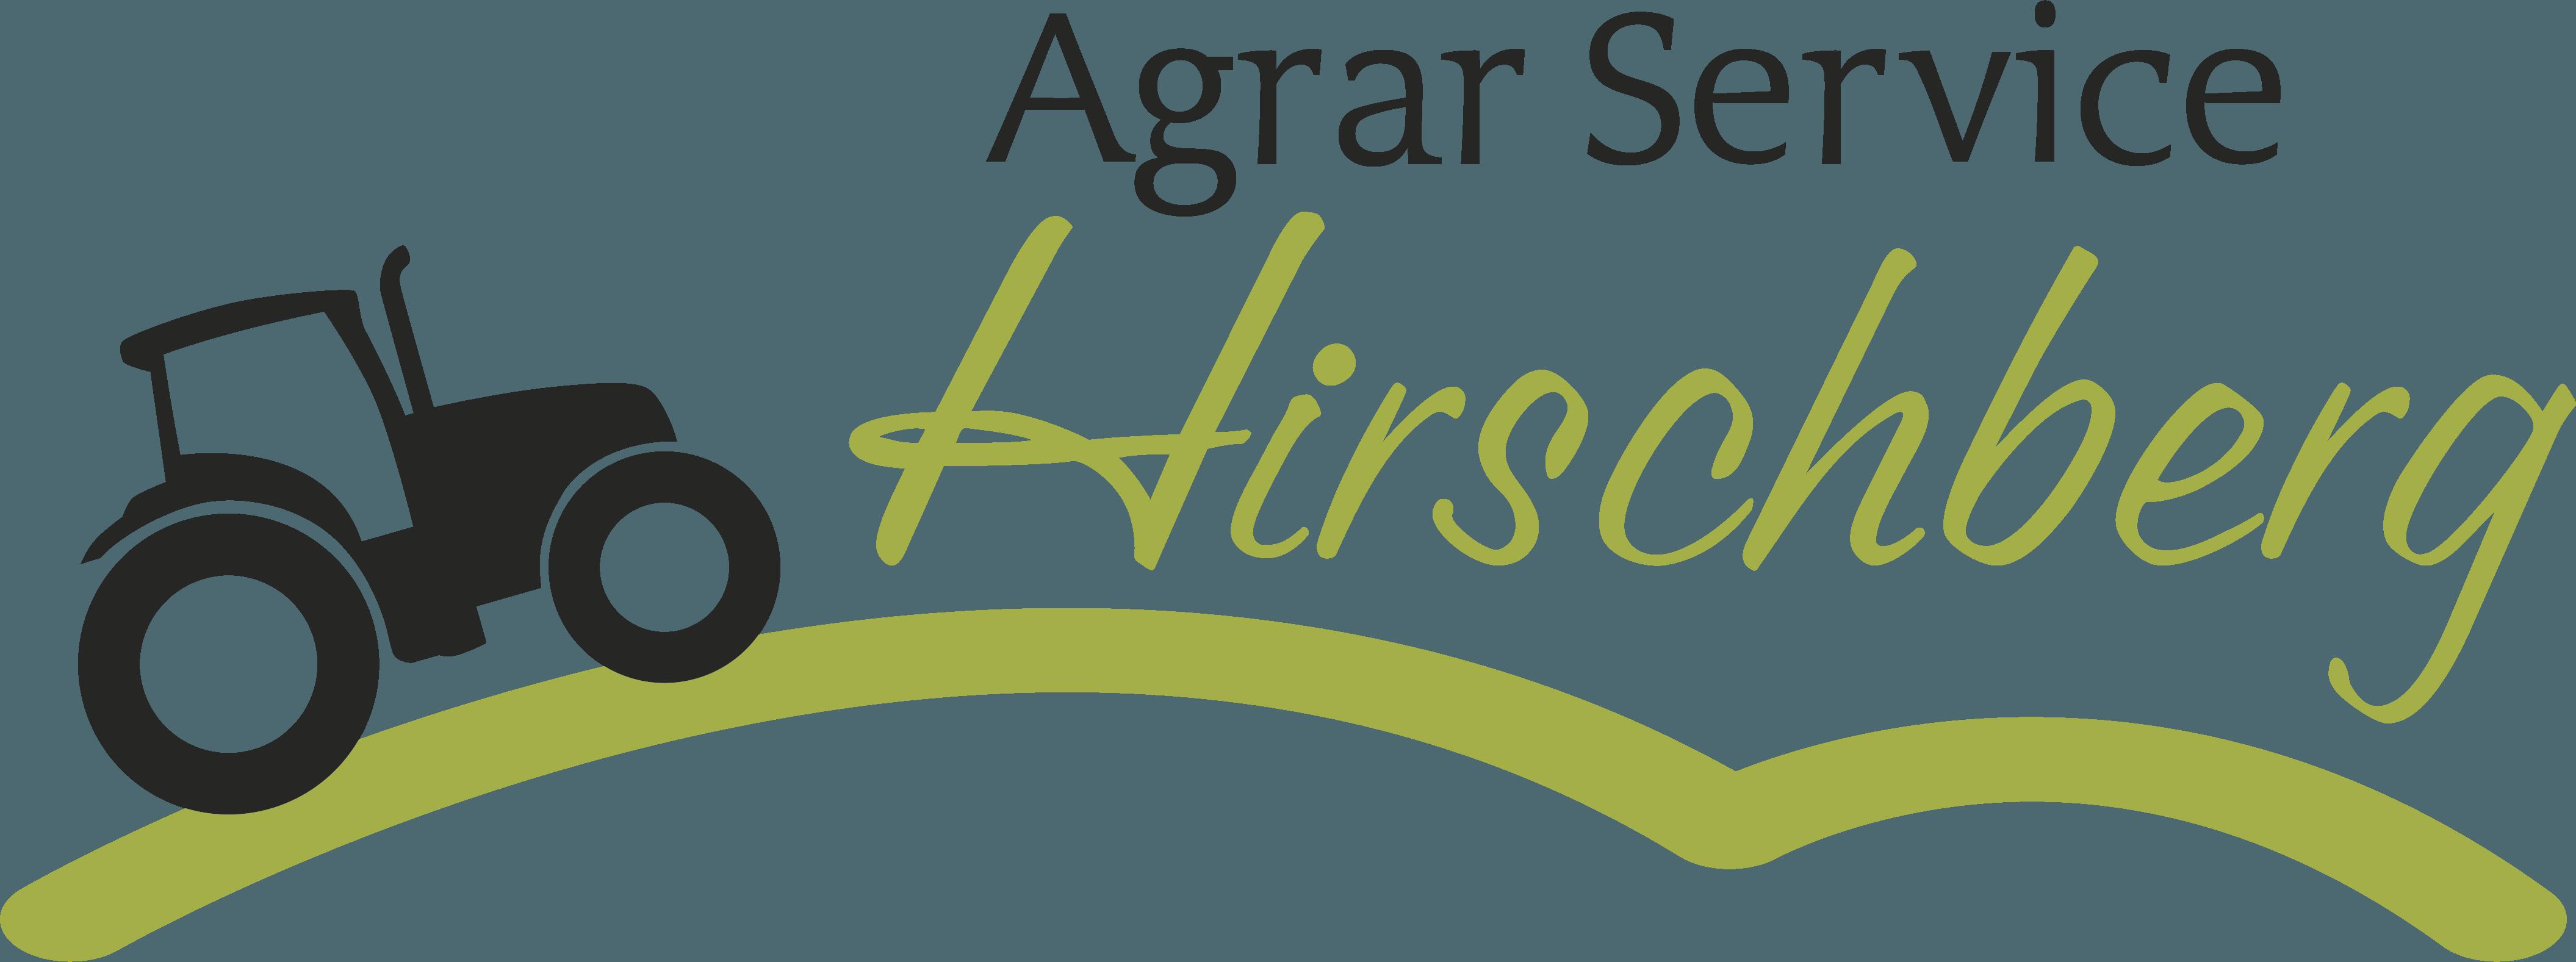 Agrarservice Hirschberg